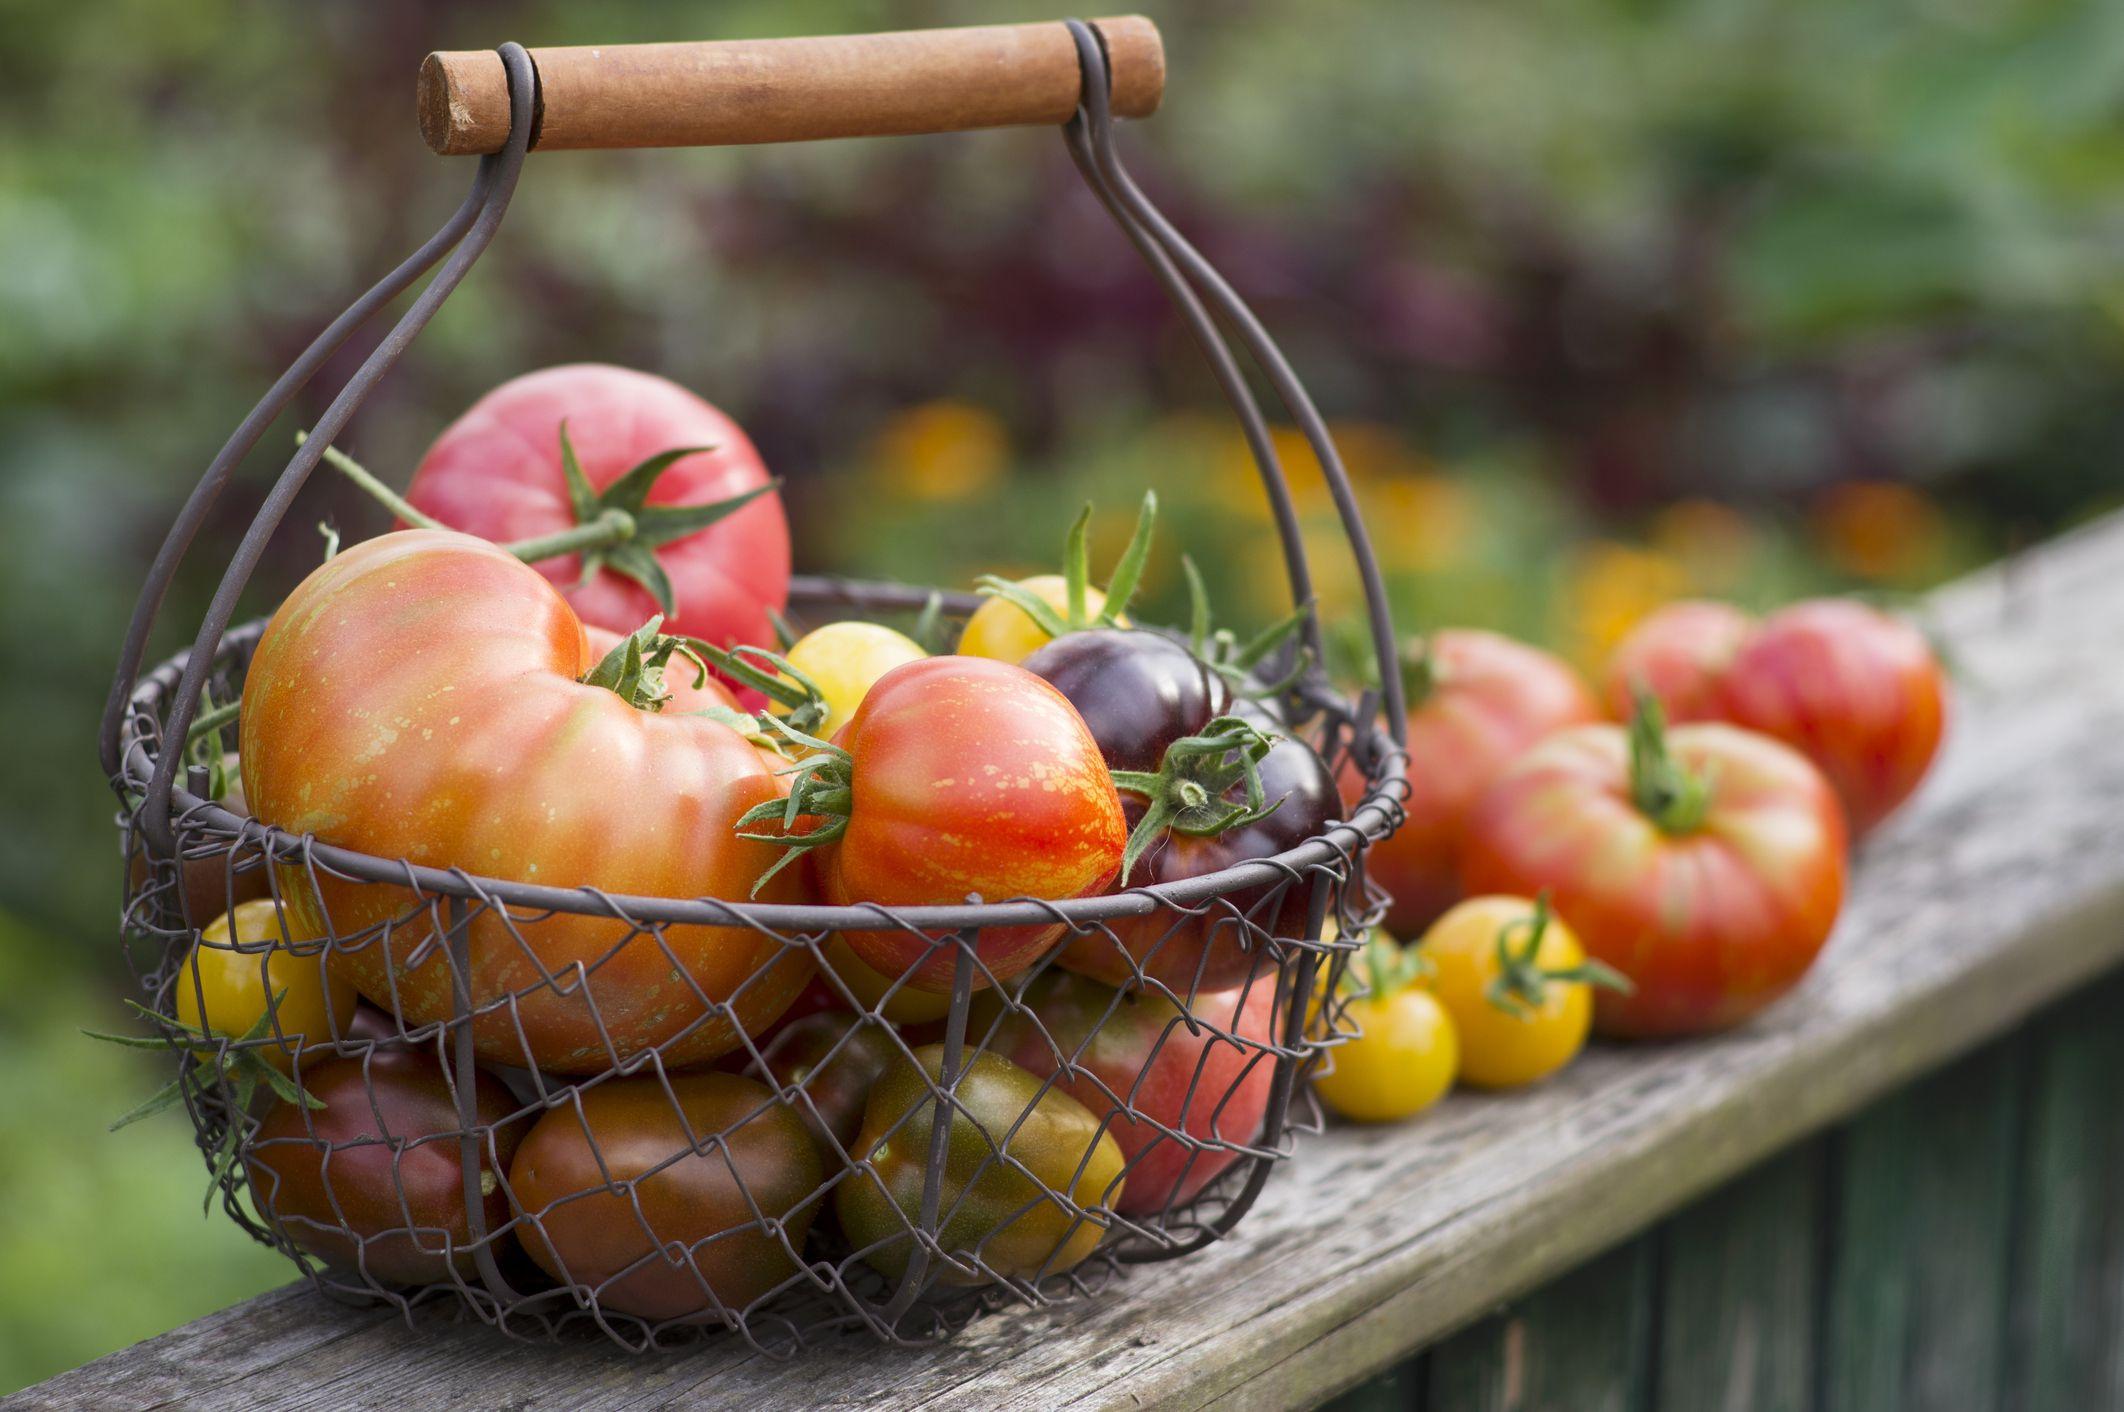 Growing Heirloom Vegetables For Home Gardeners